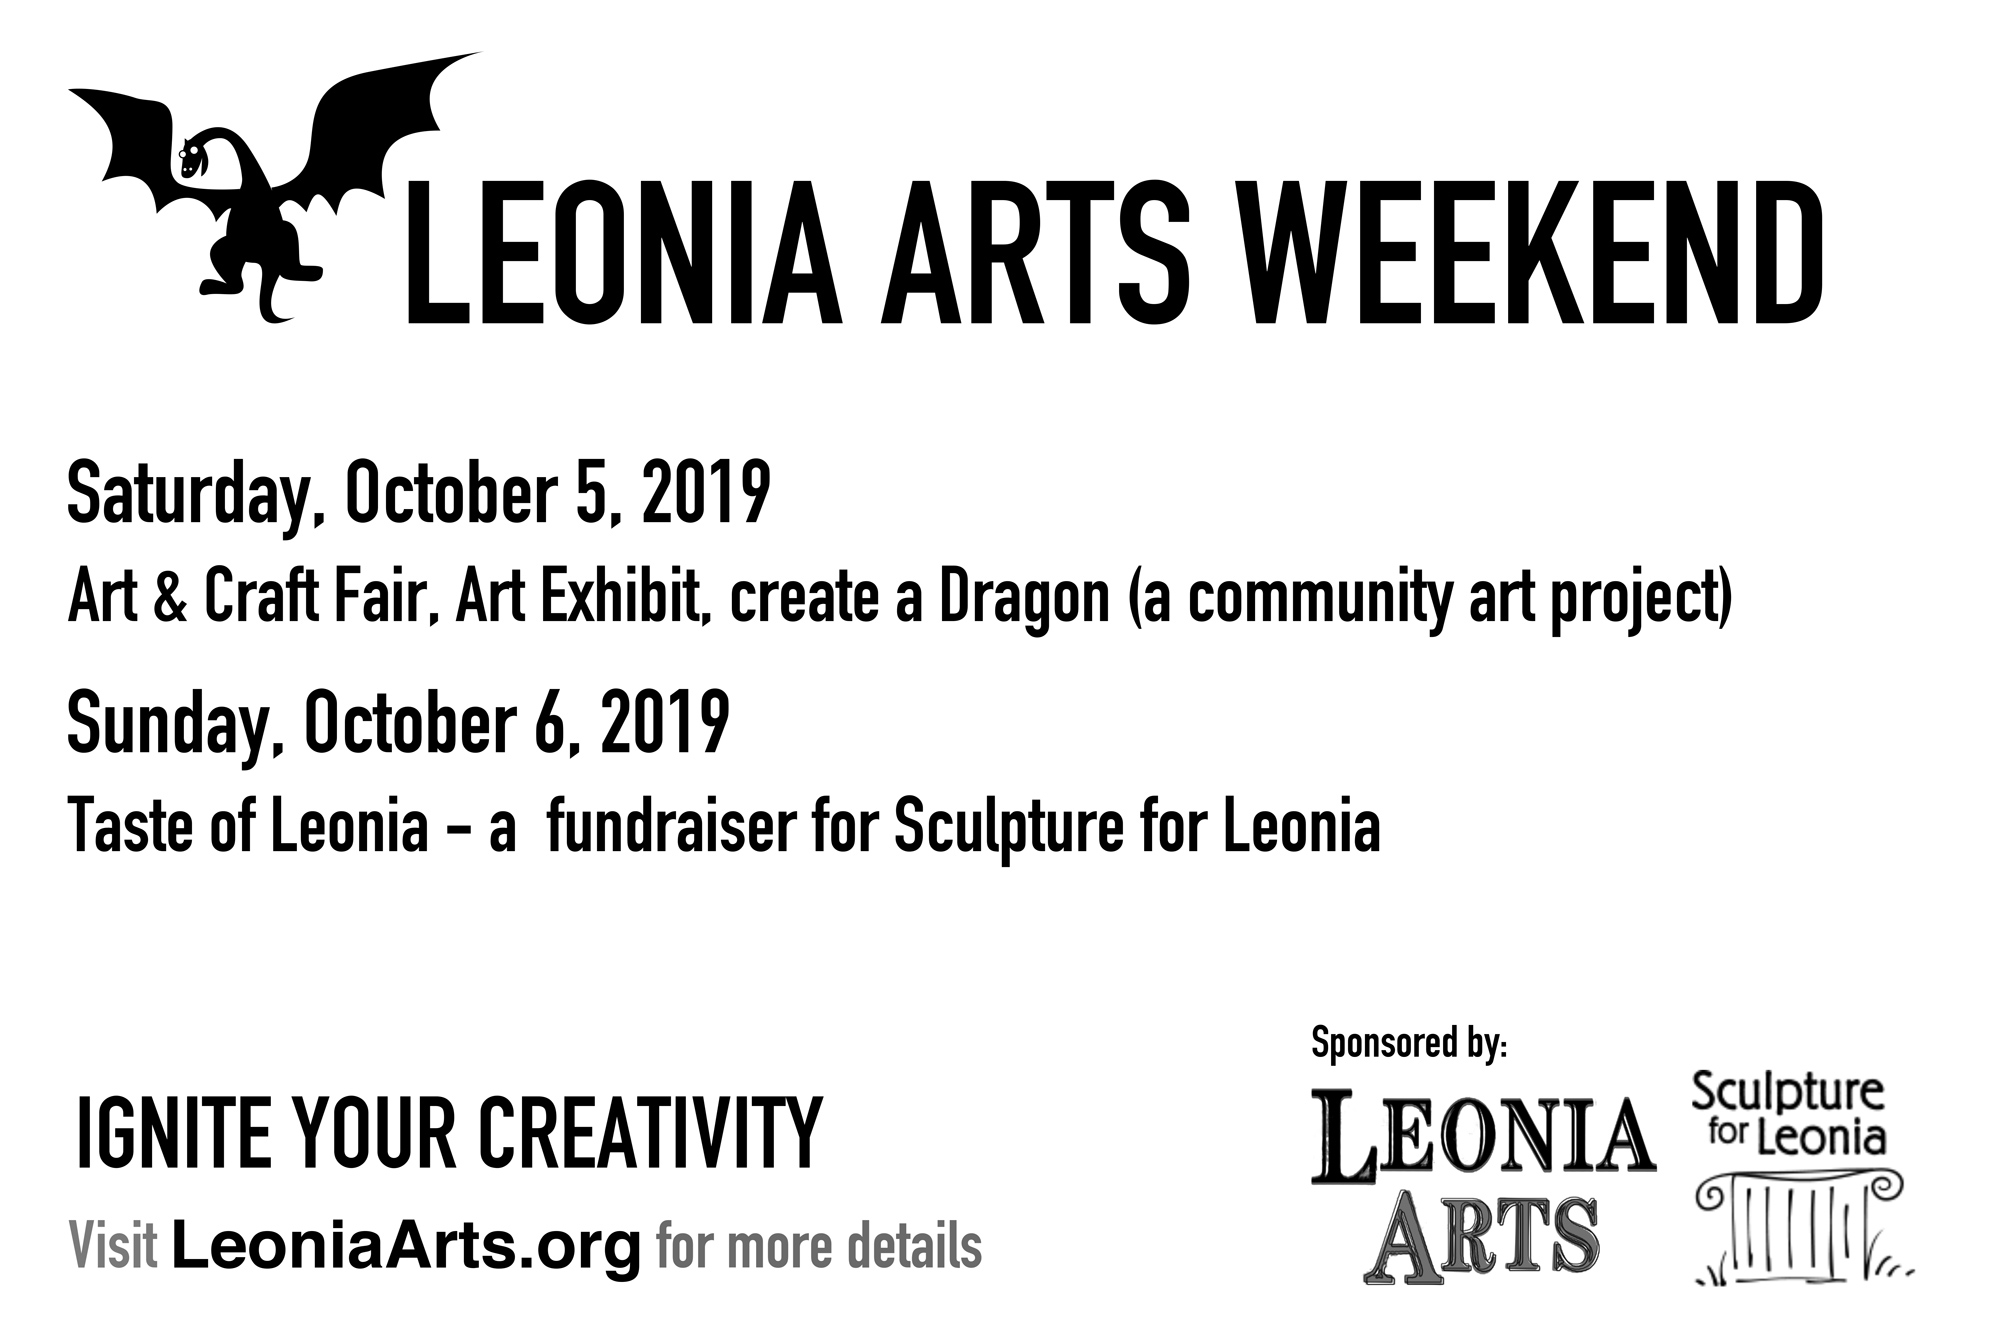 Leonia Arts Weekend - October 5 & 6, 2019